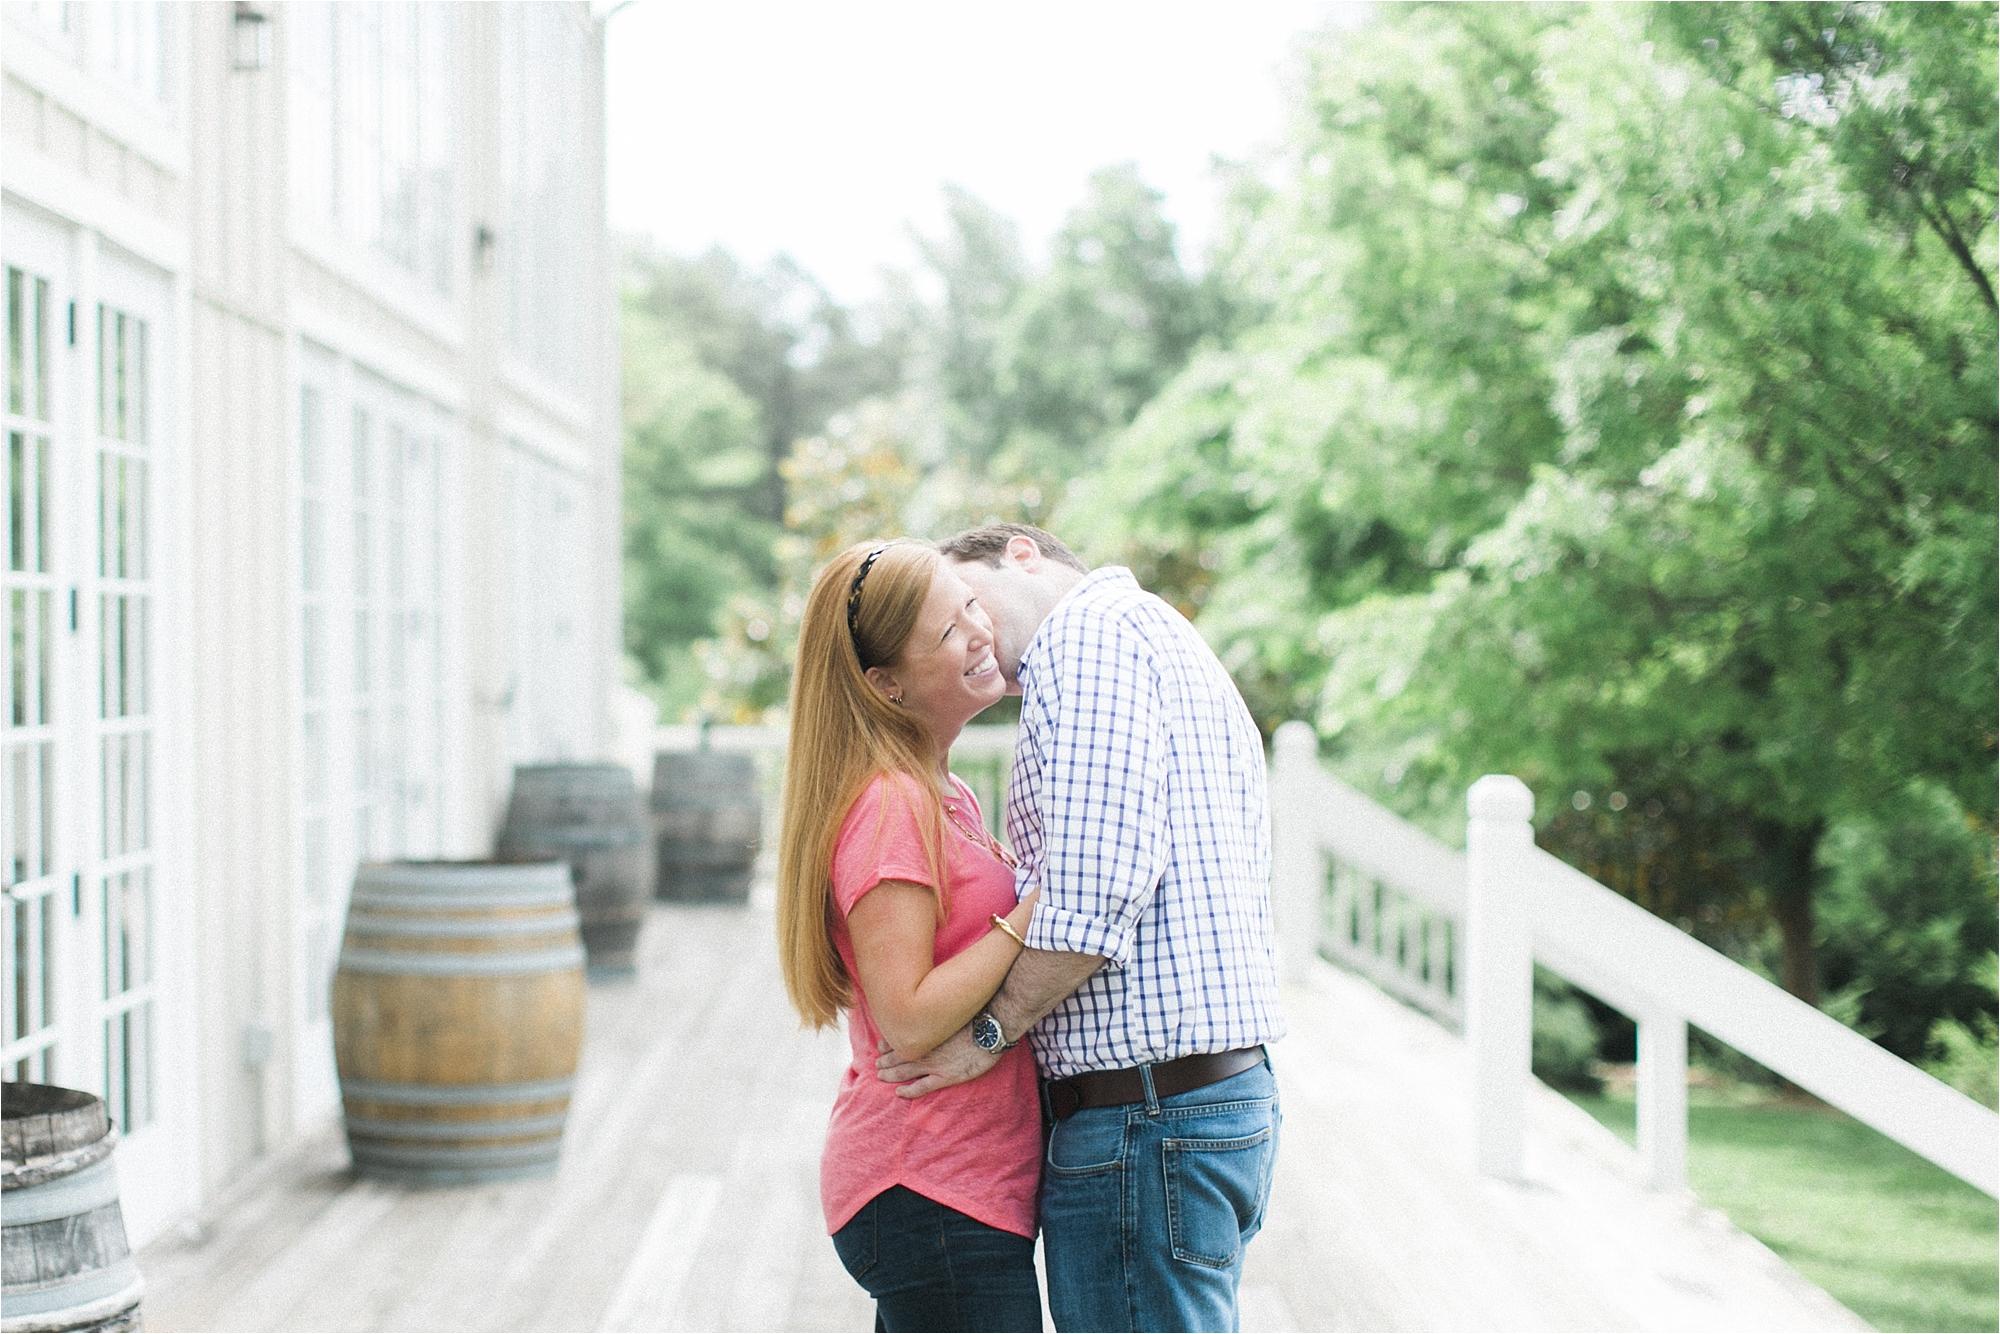 stephanie-yonce-vertias-winery-engagement-photo_0006.jpg